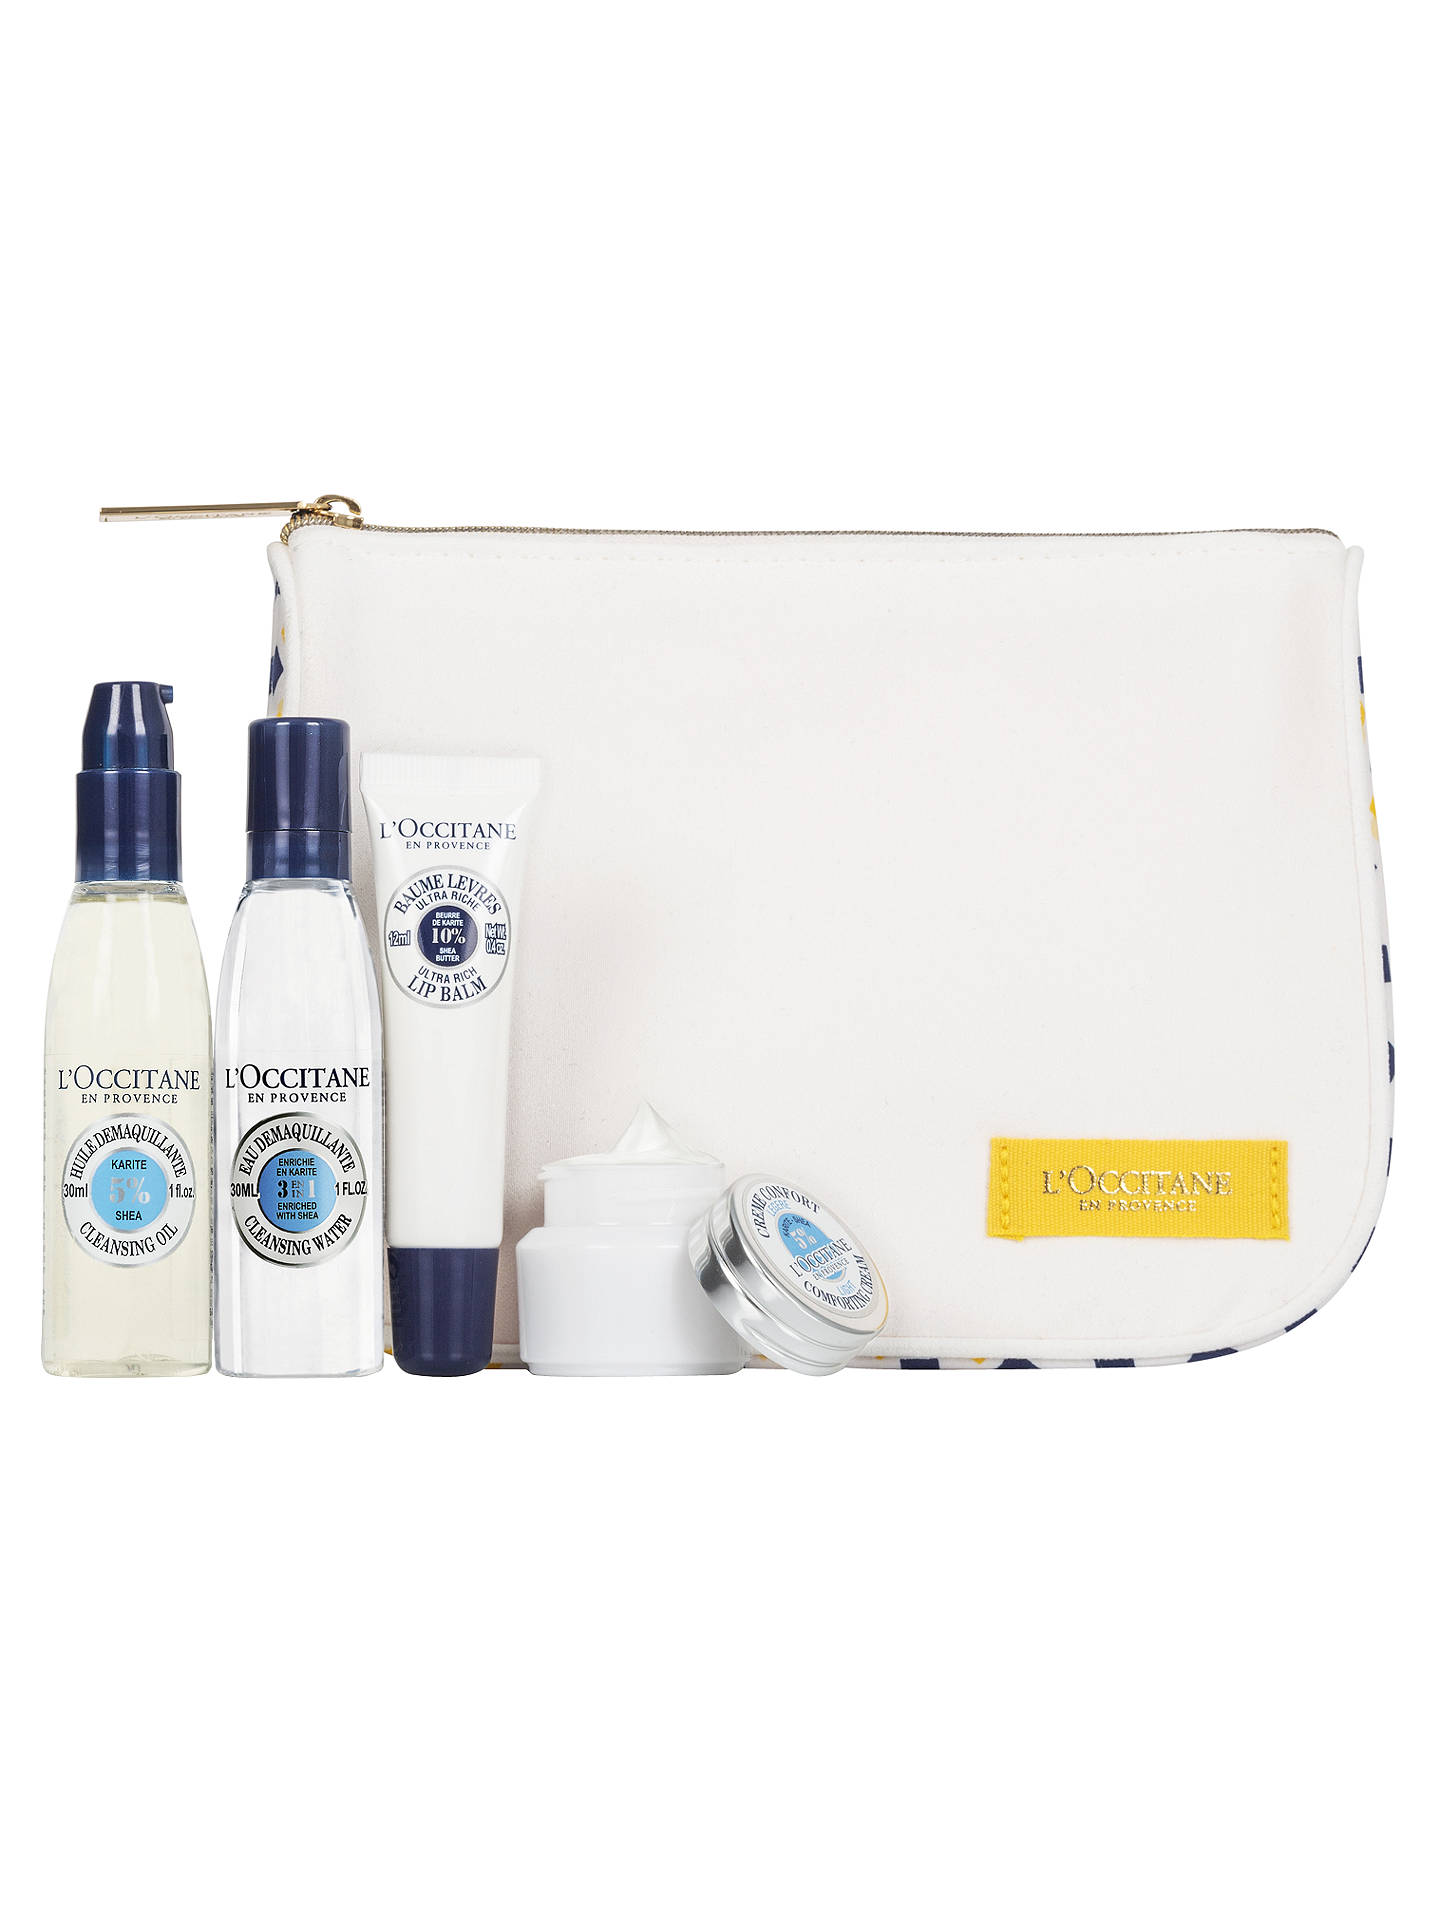 LOccitane Shea Butter Skincare Travel Ritual Gift Set